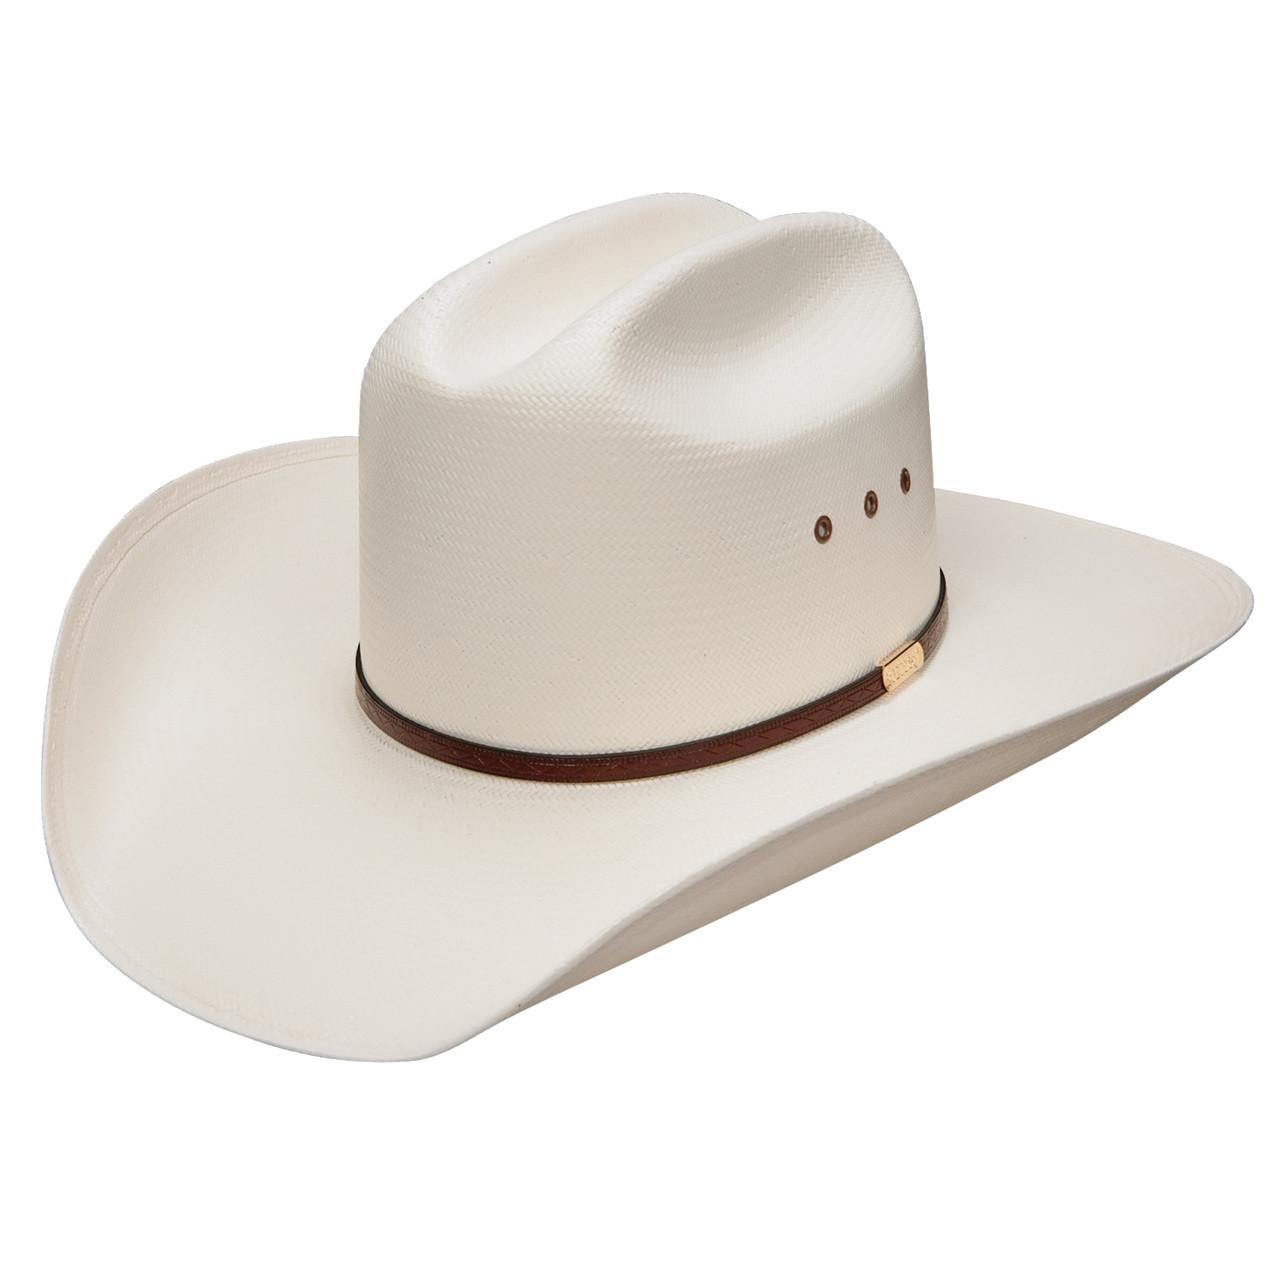 c3e691e6203b2 Stetson Mens Hats - Maddock - 10X Natural Comfort Straw Cowboy Hat ...